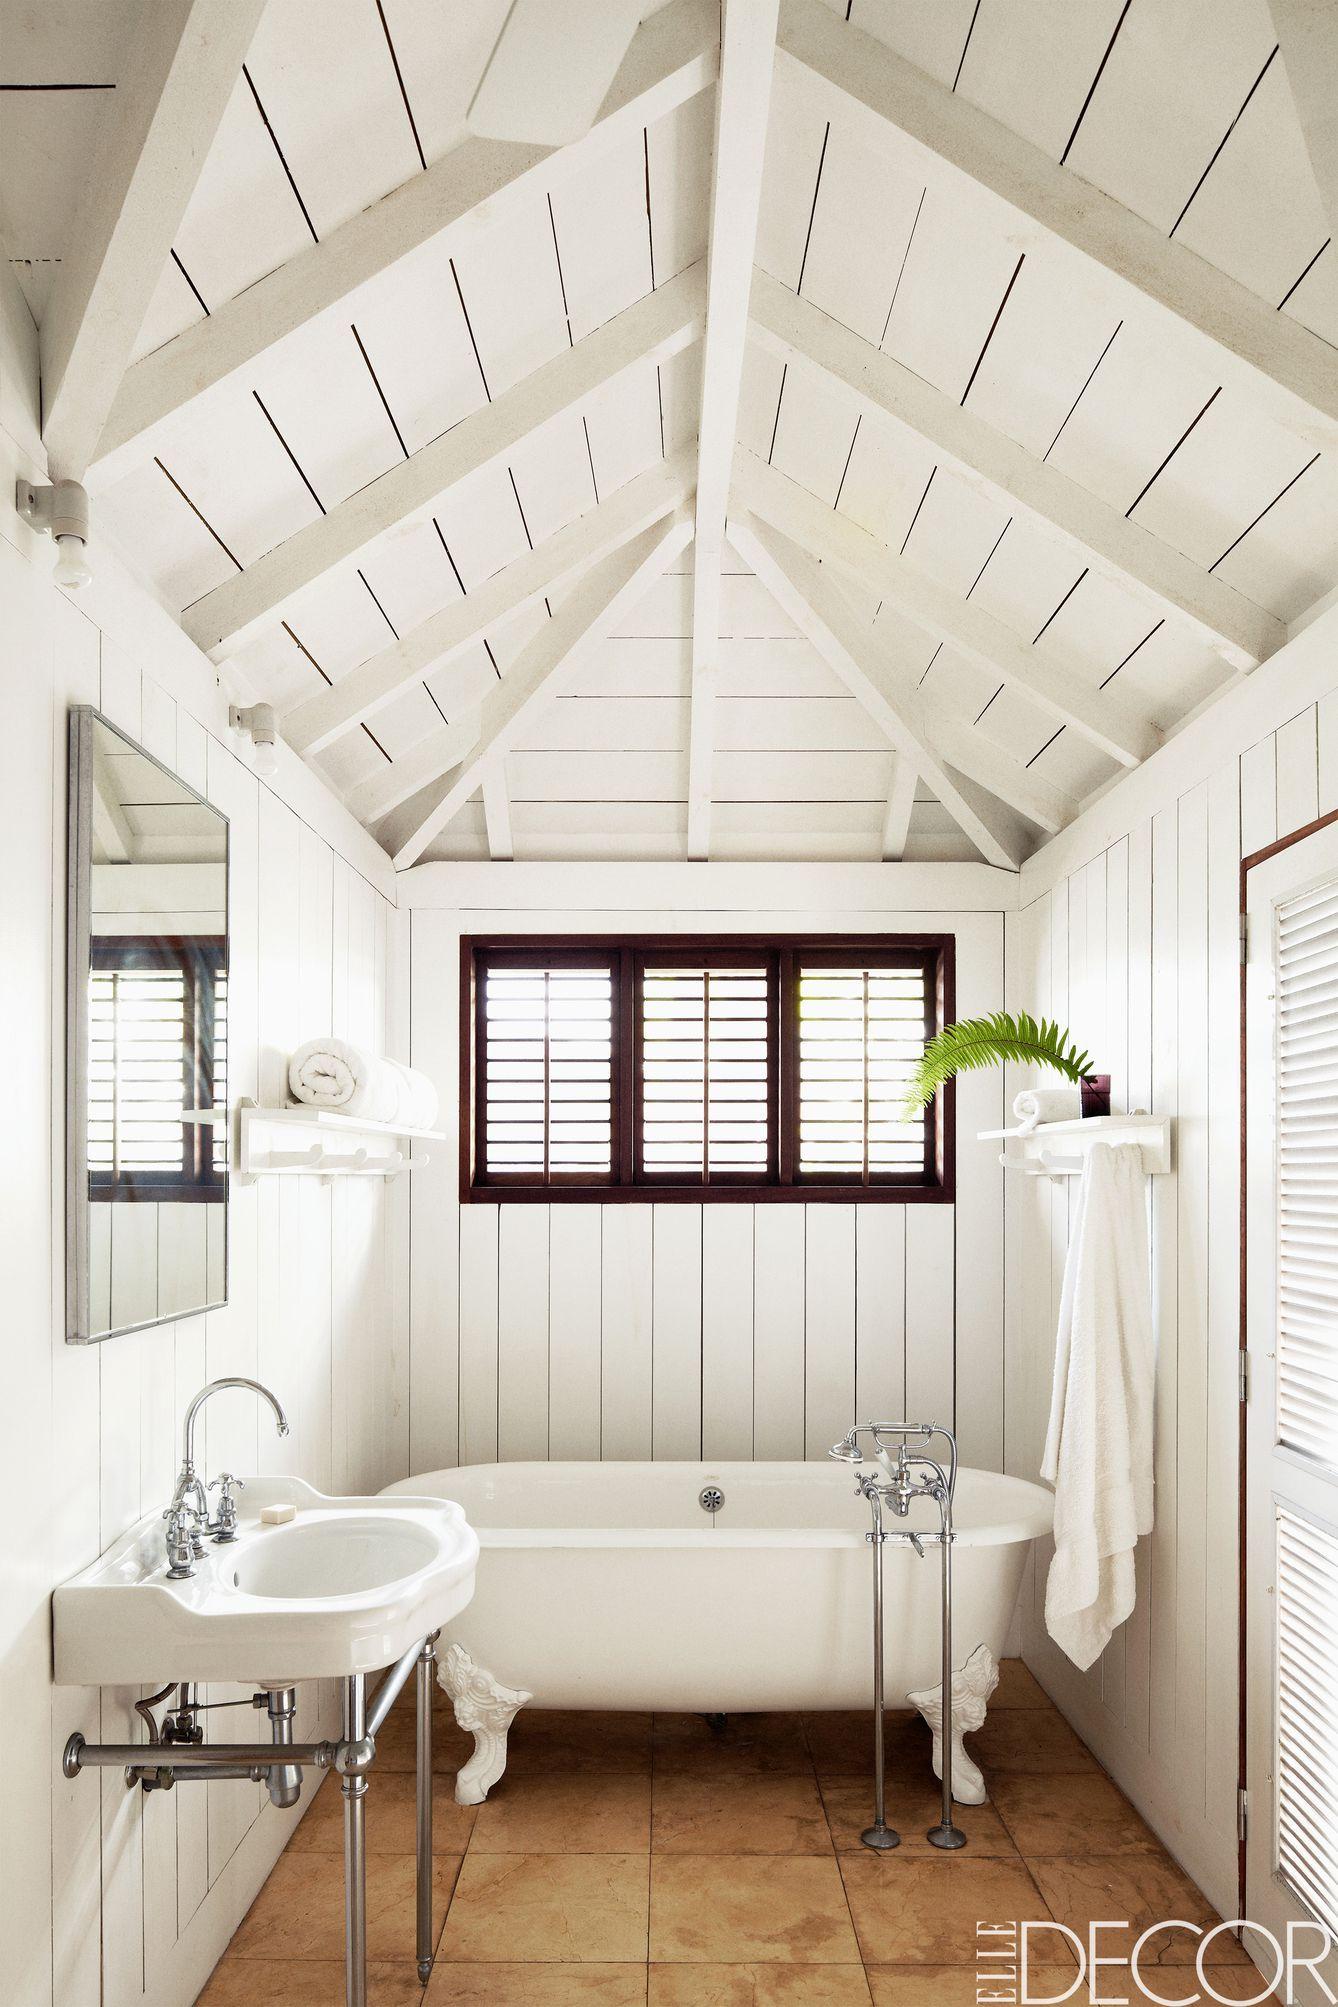 William Abranowicz. Beachy White Bathroom